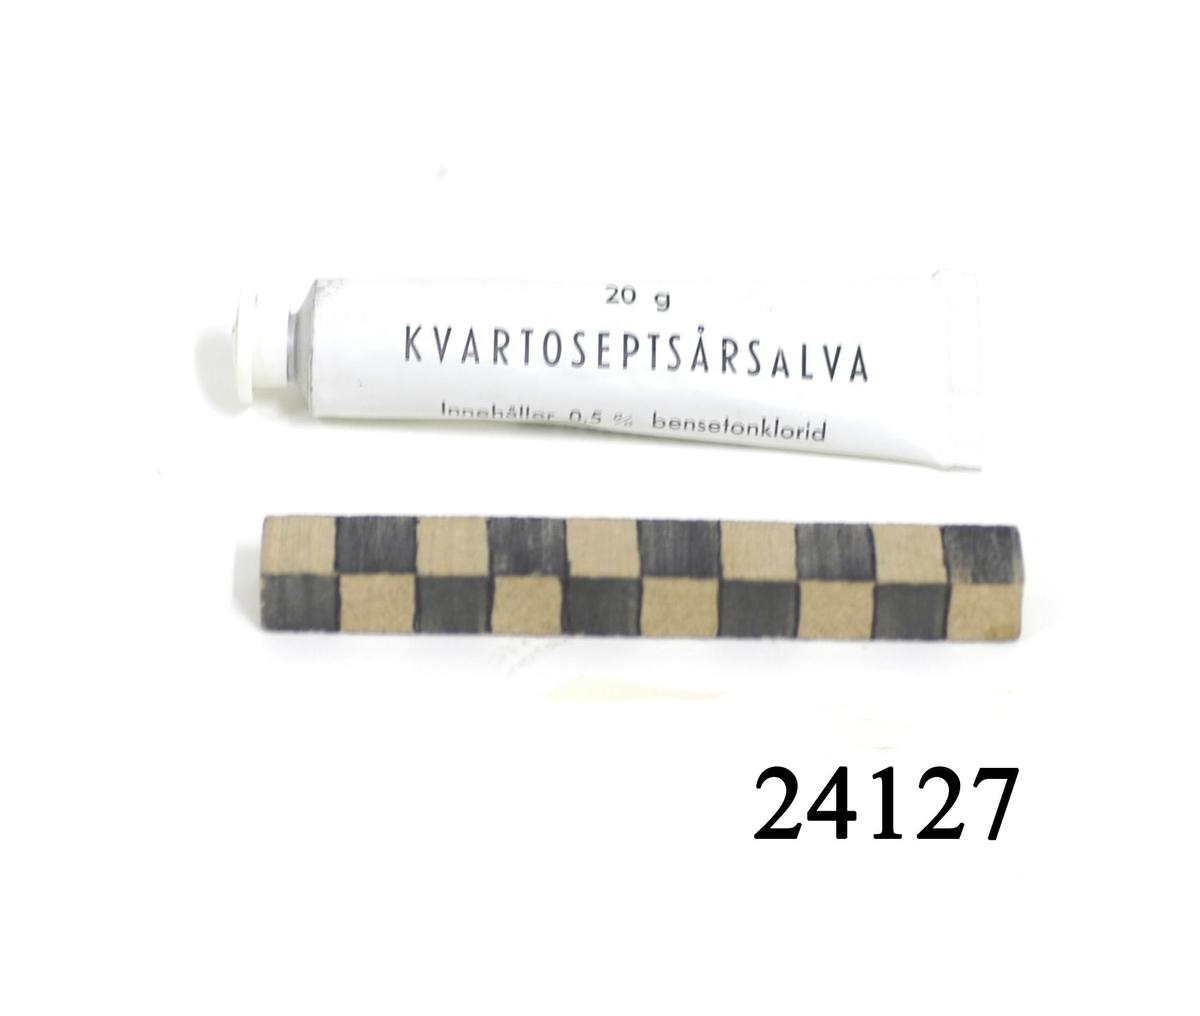 "Vit tub av metall, vit skruvkork av plast. På tuben svart text: ""20 g Kvartoseptsårsalva Innehåller 0,5 % bensetonklorid. MILITÄRAPOTEKET STOCKHOLM, 56""."